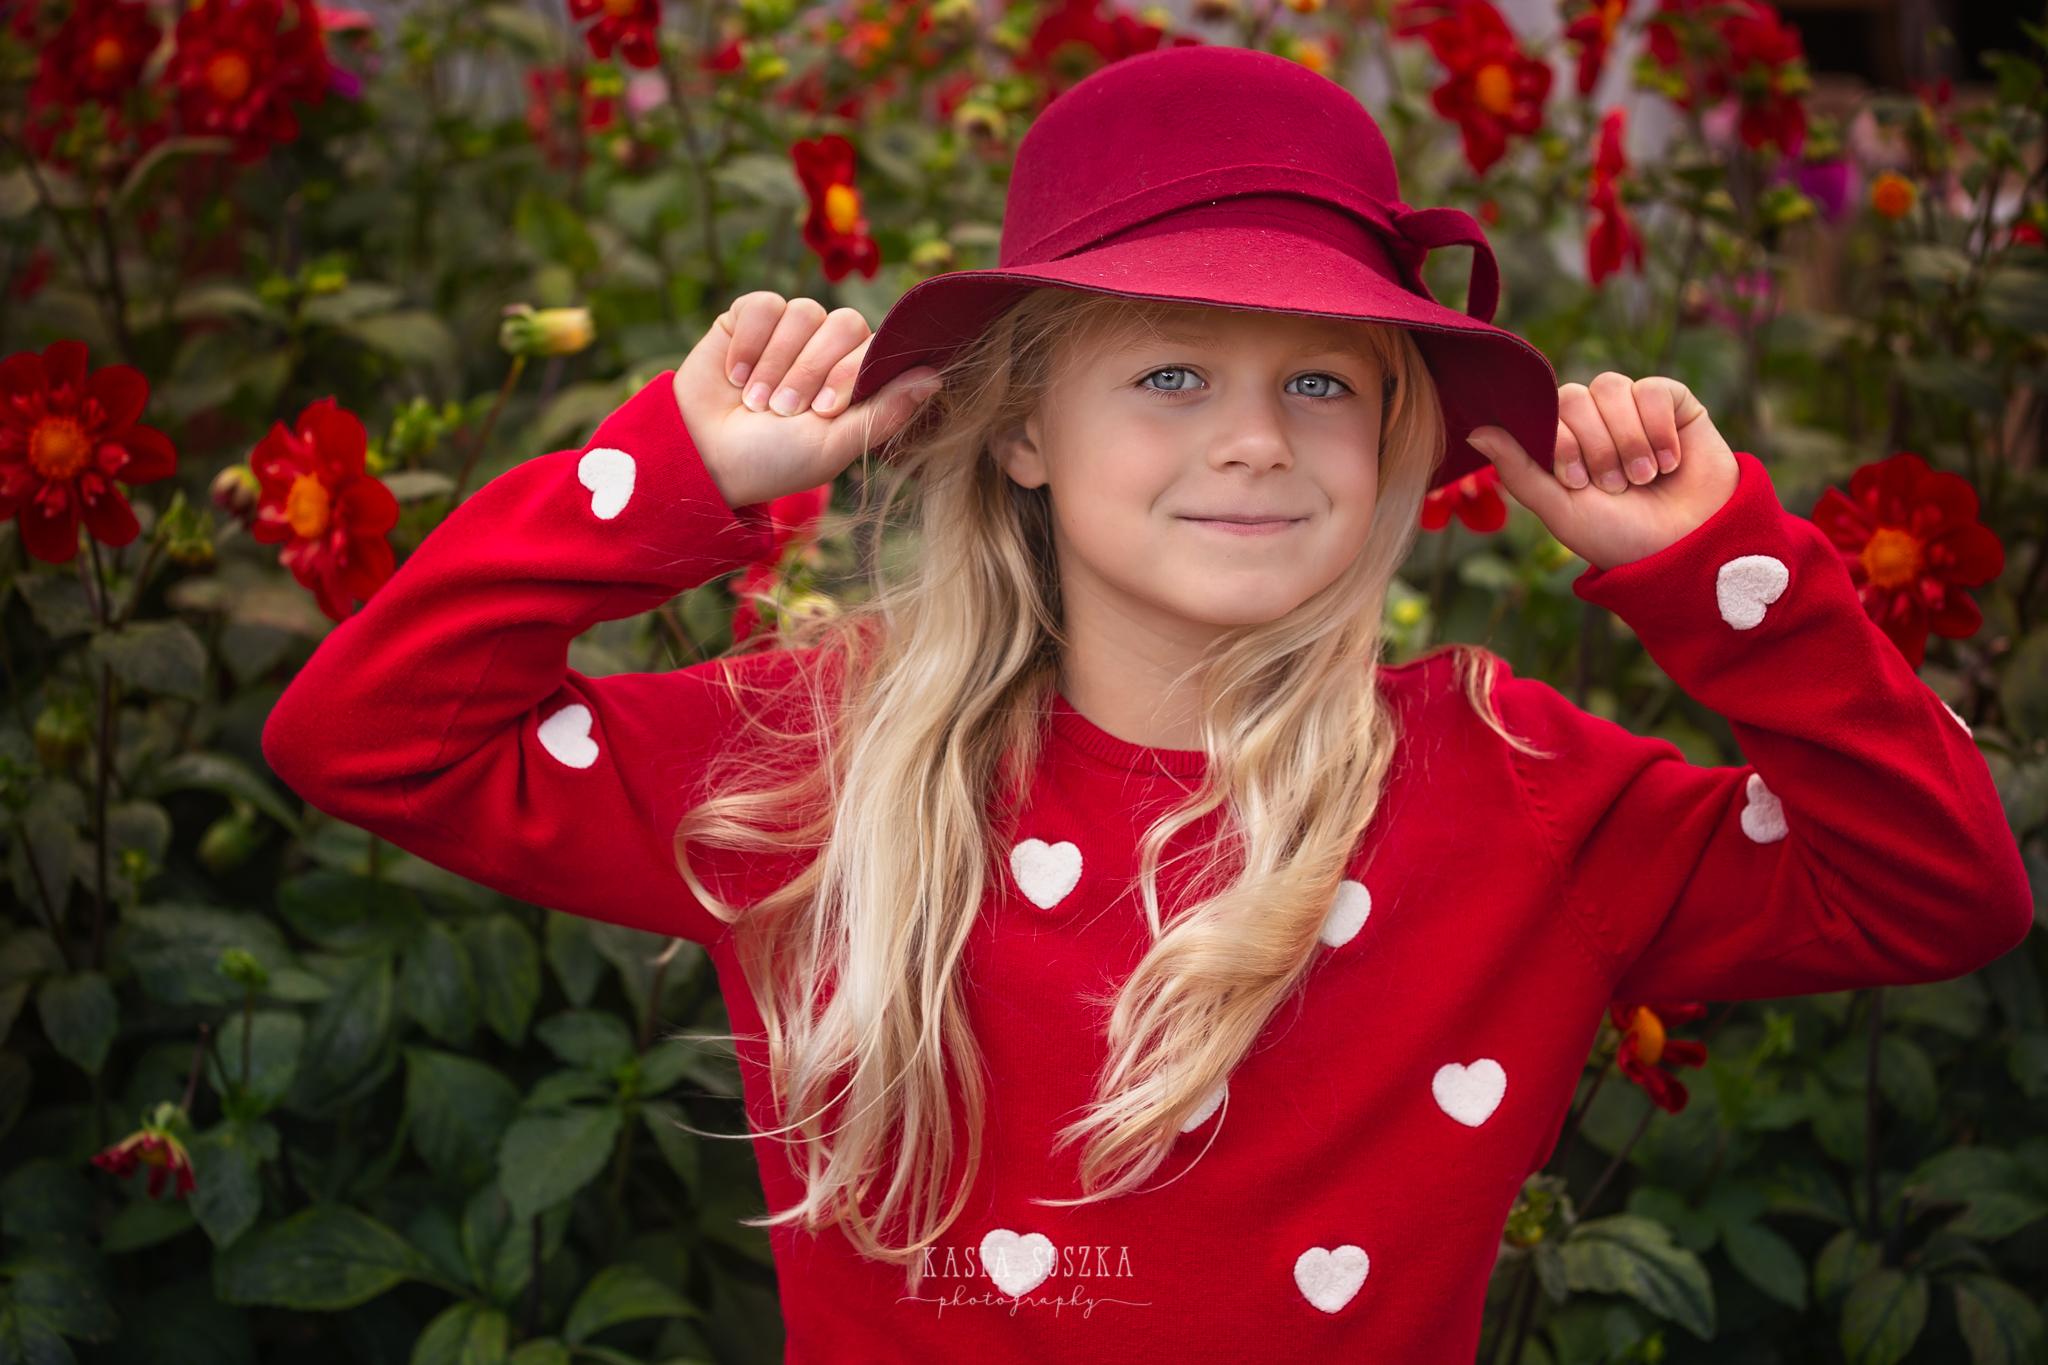 Children photography, child photographer Leeds, York, Bradford, Harrogate: pretty blond girl with blue eyes posing for a portrait against purple autumn flowers